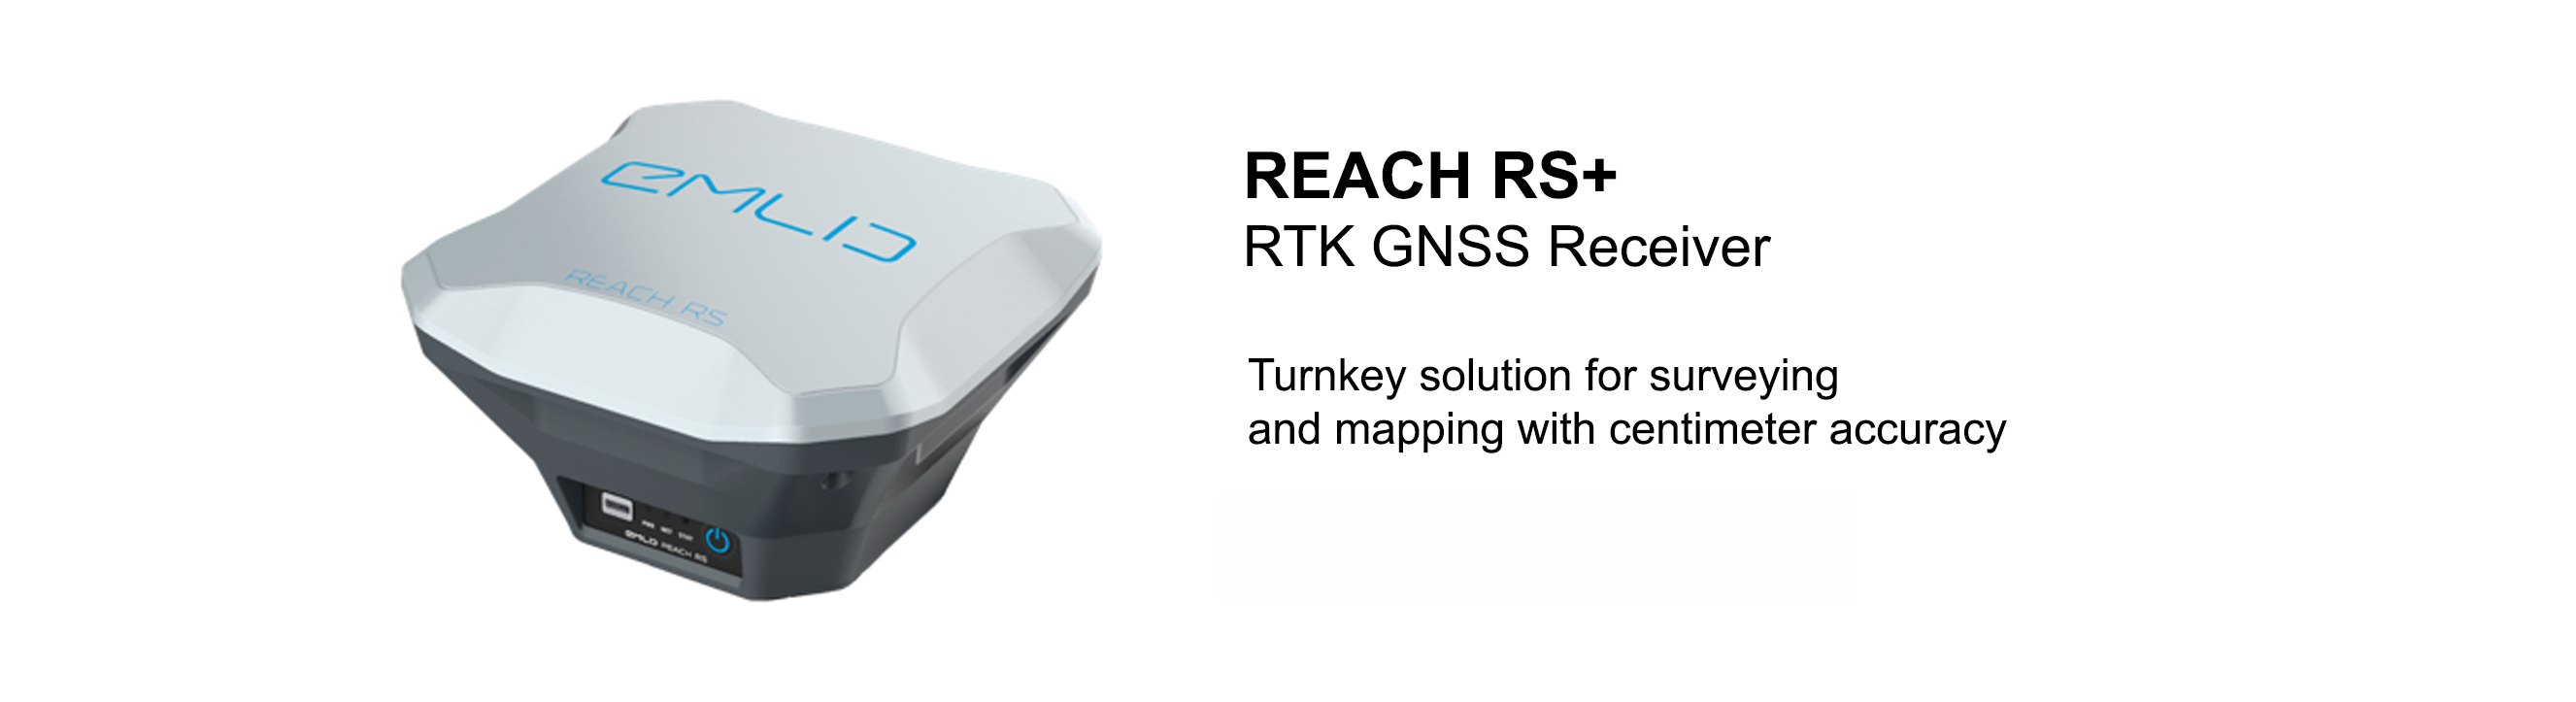 Emlid_Reach_RS_Drones_Imaging